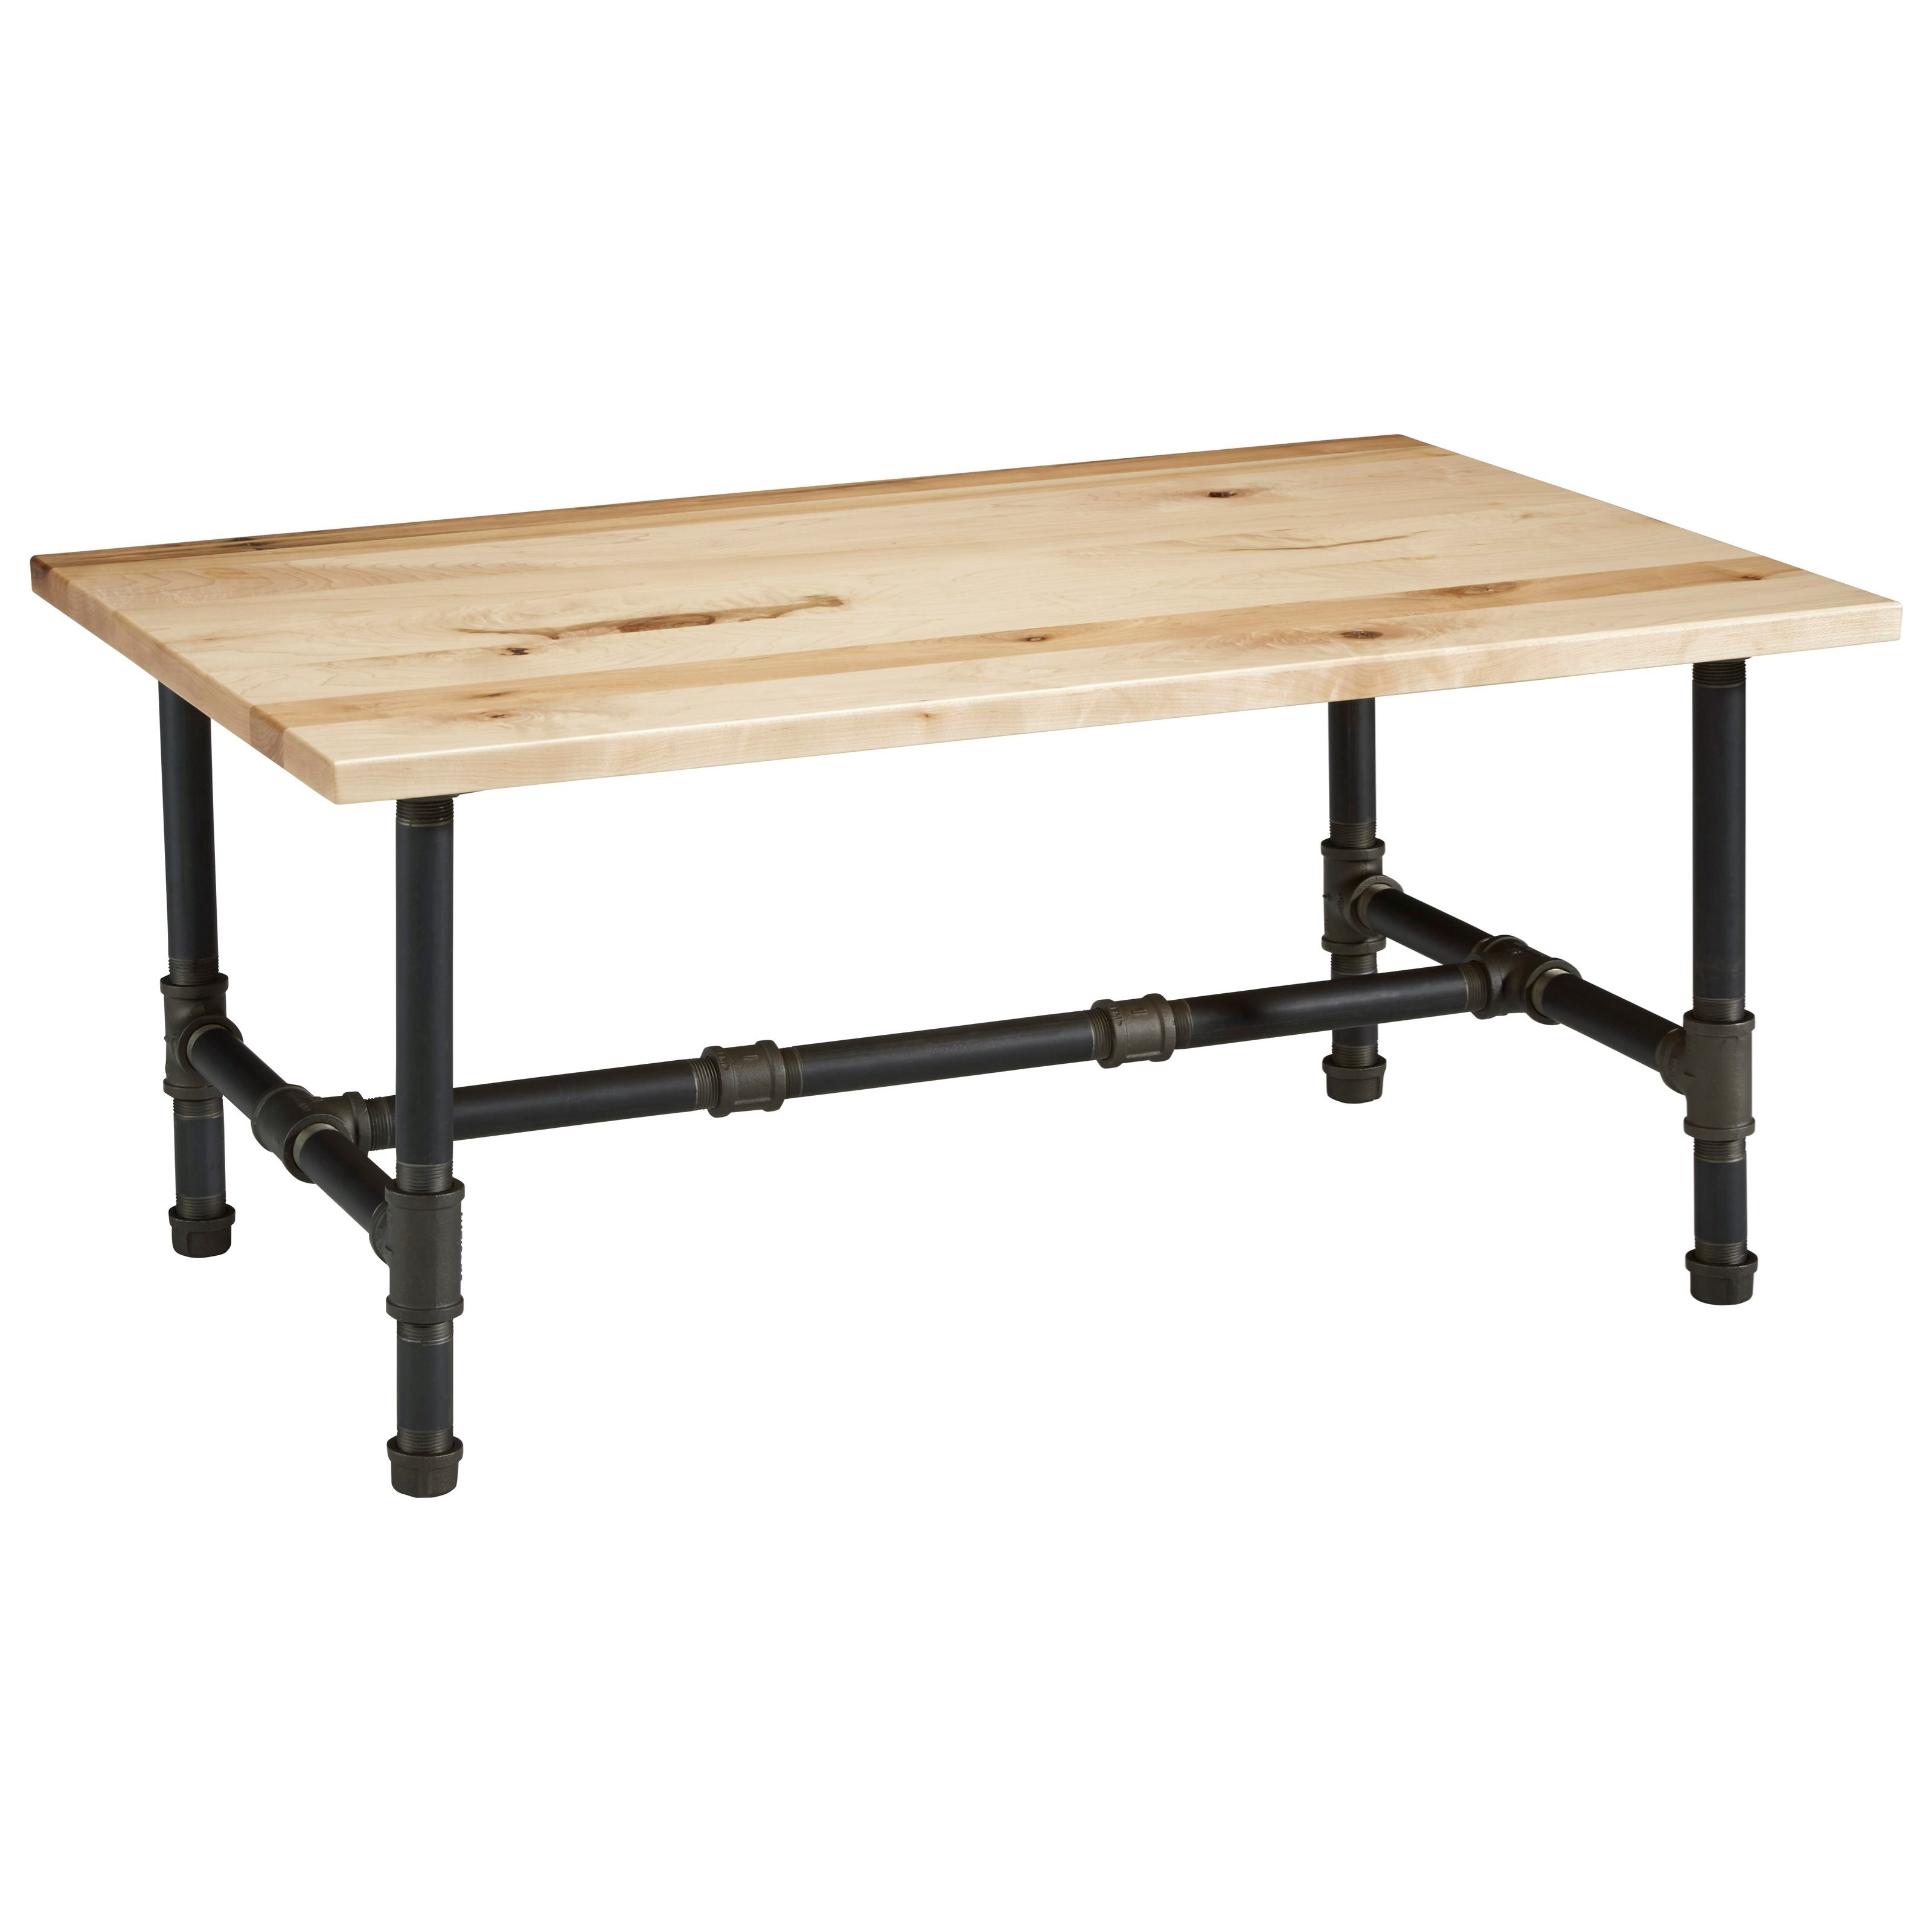 Aspen Cocktail Table by Progressive Furniture at Carolina Direct